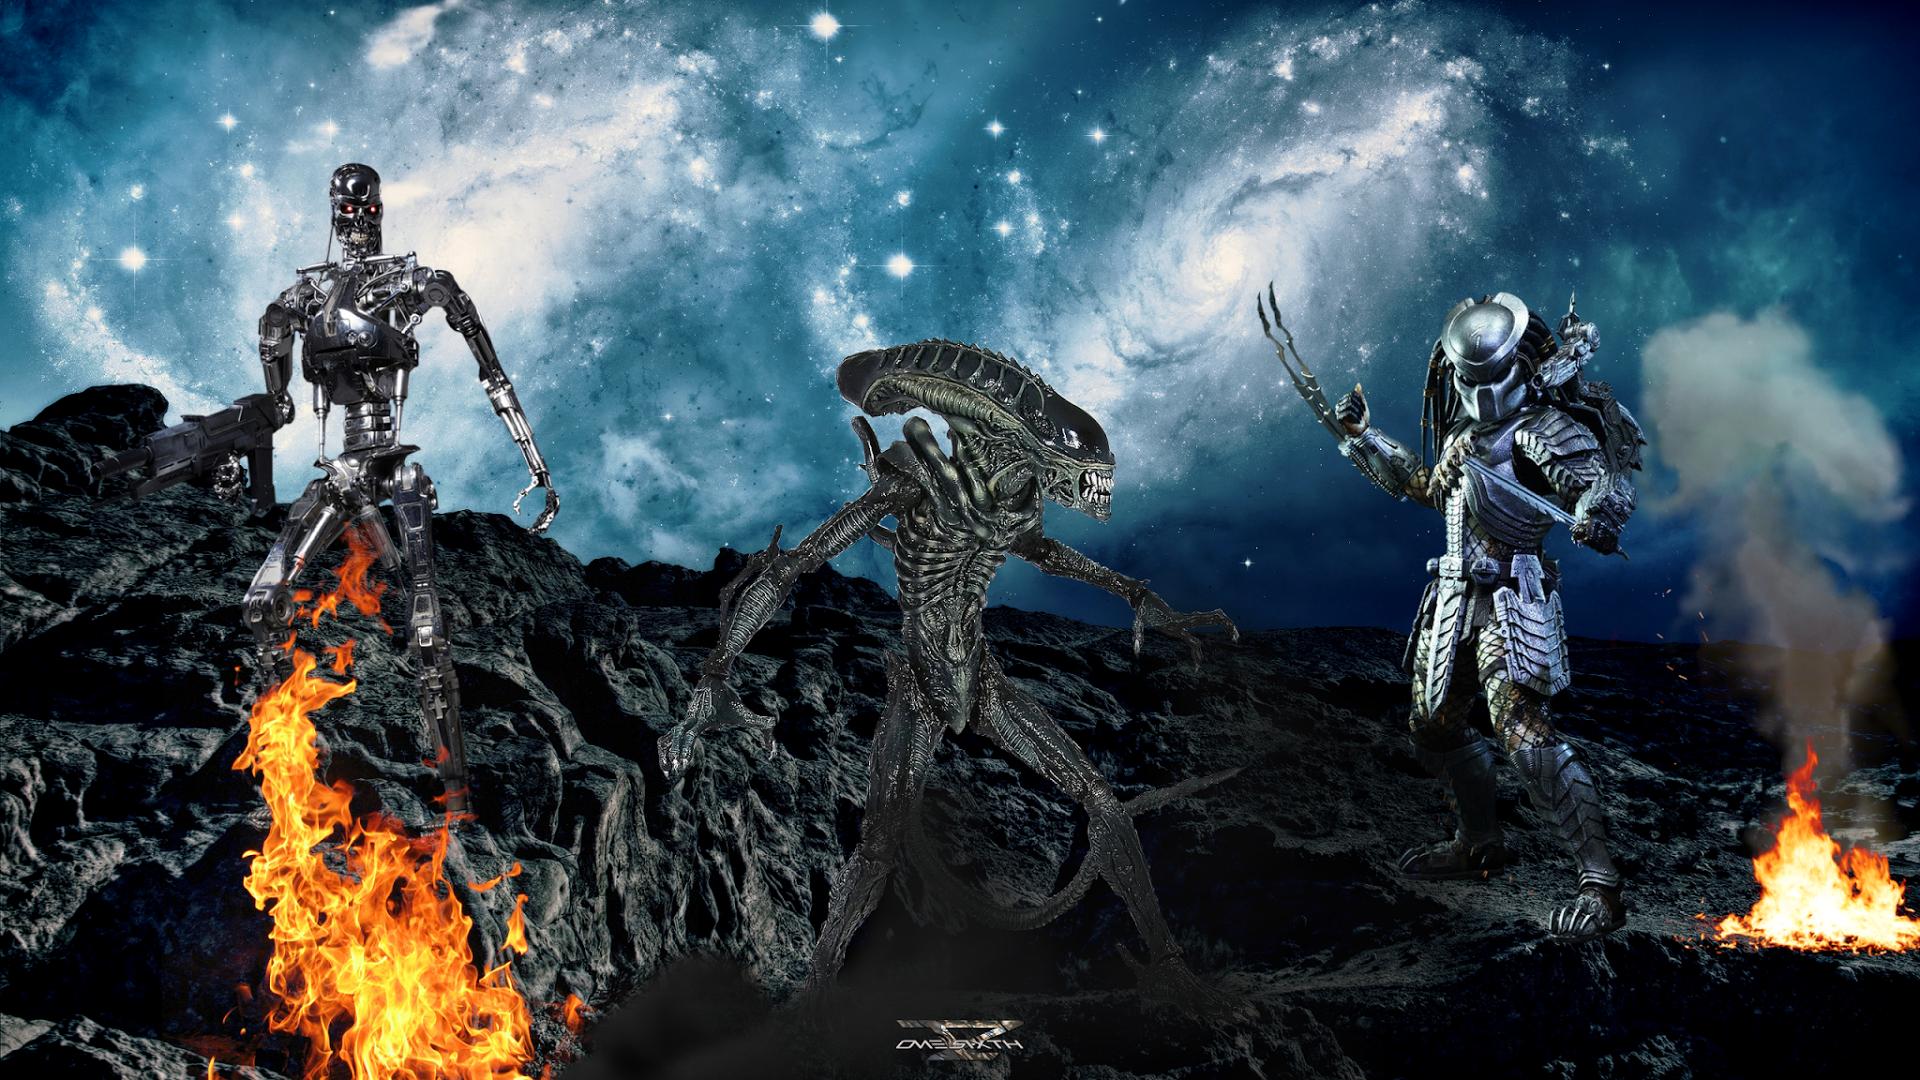 Free Download Alien Vs Predator Vs Terminator Hot Toys Full Hd